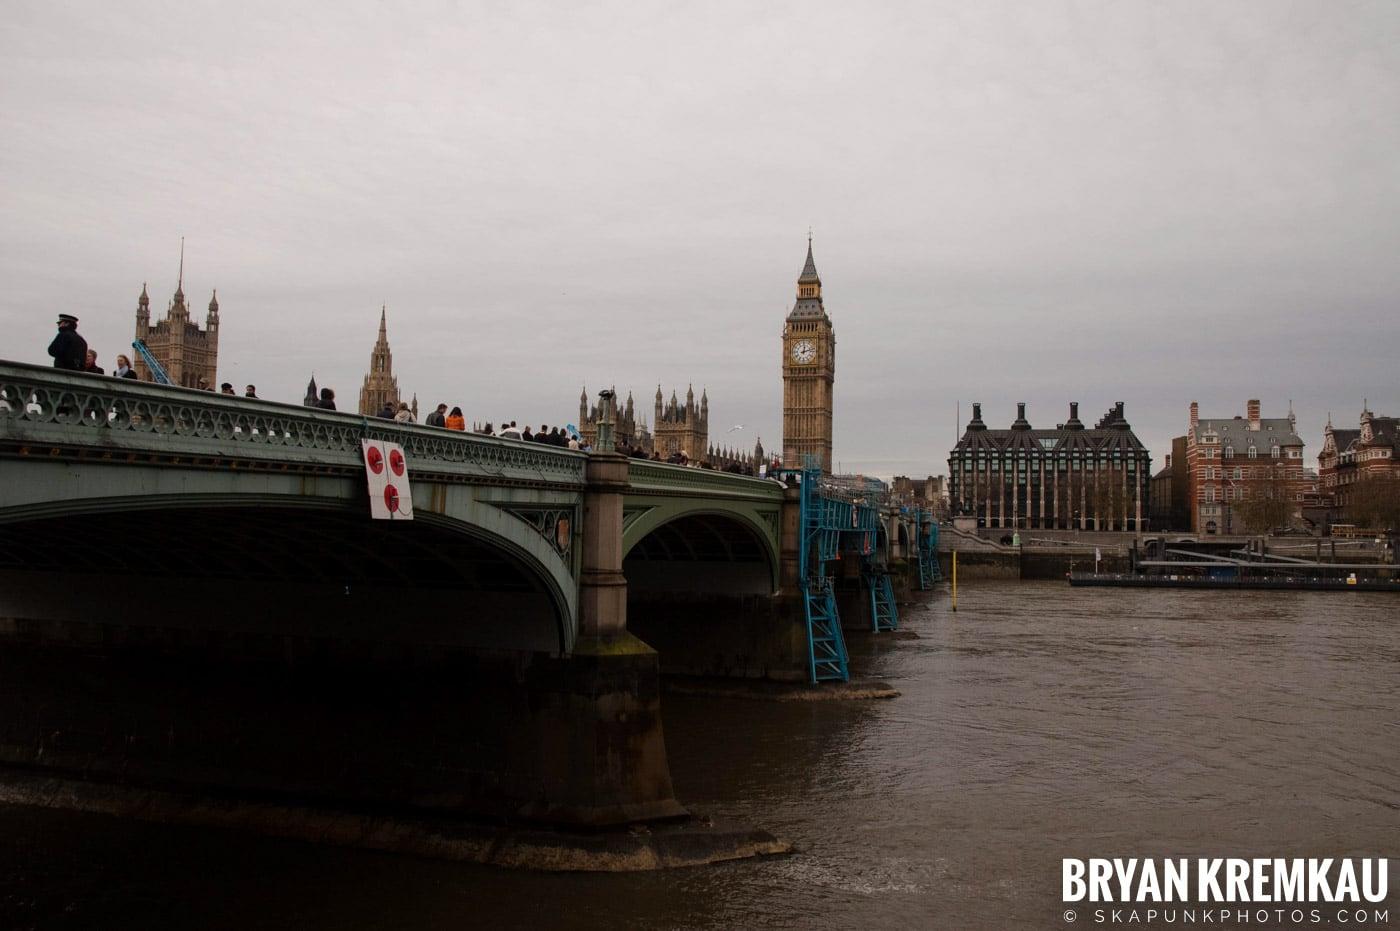 London, England - Day 3 - 12.10.06 (10)